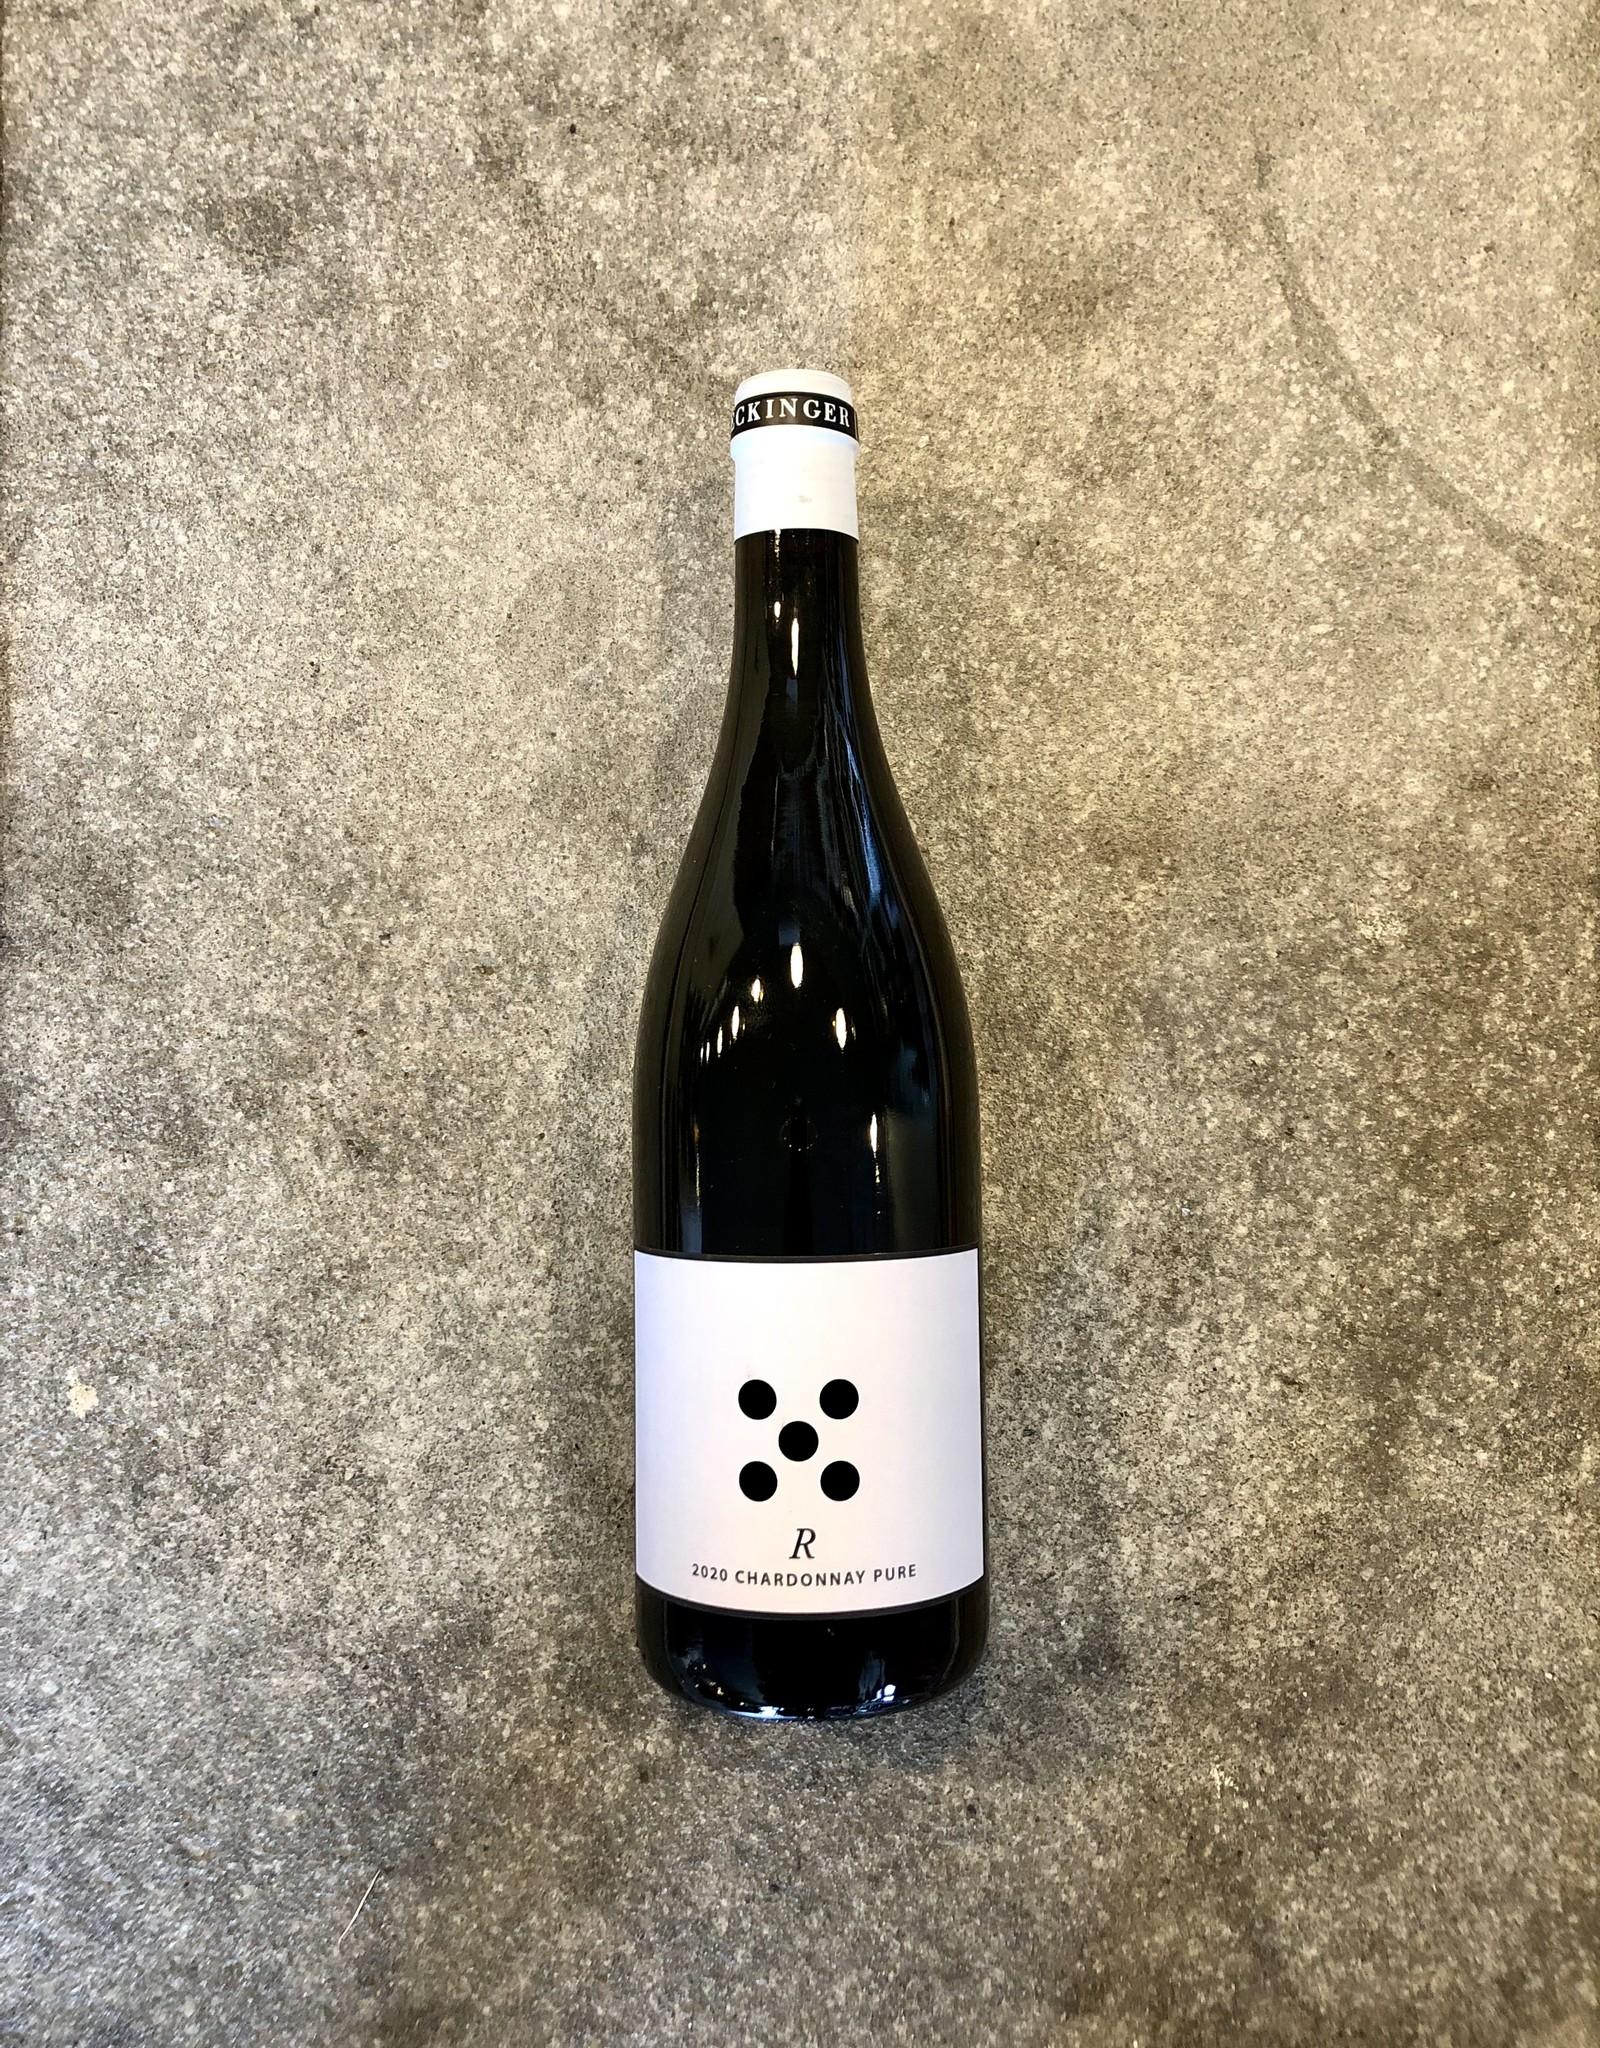 Seckinger Chardonnay Pure R 2020